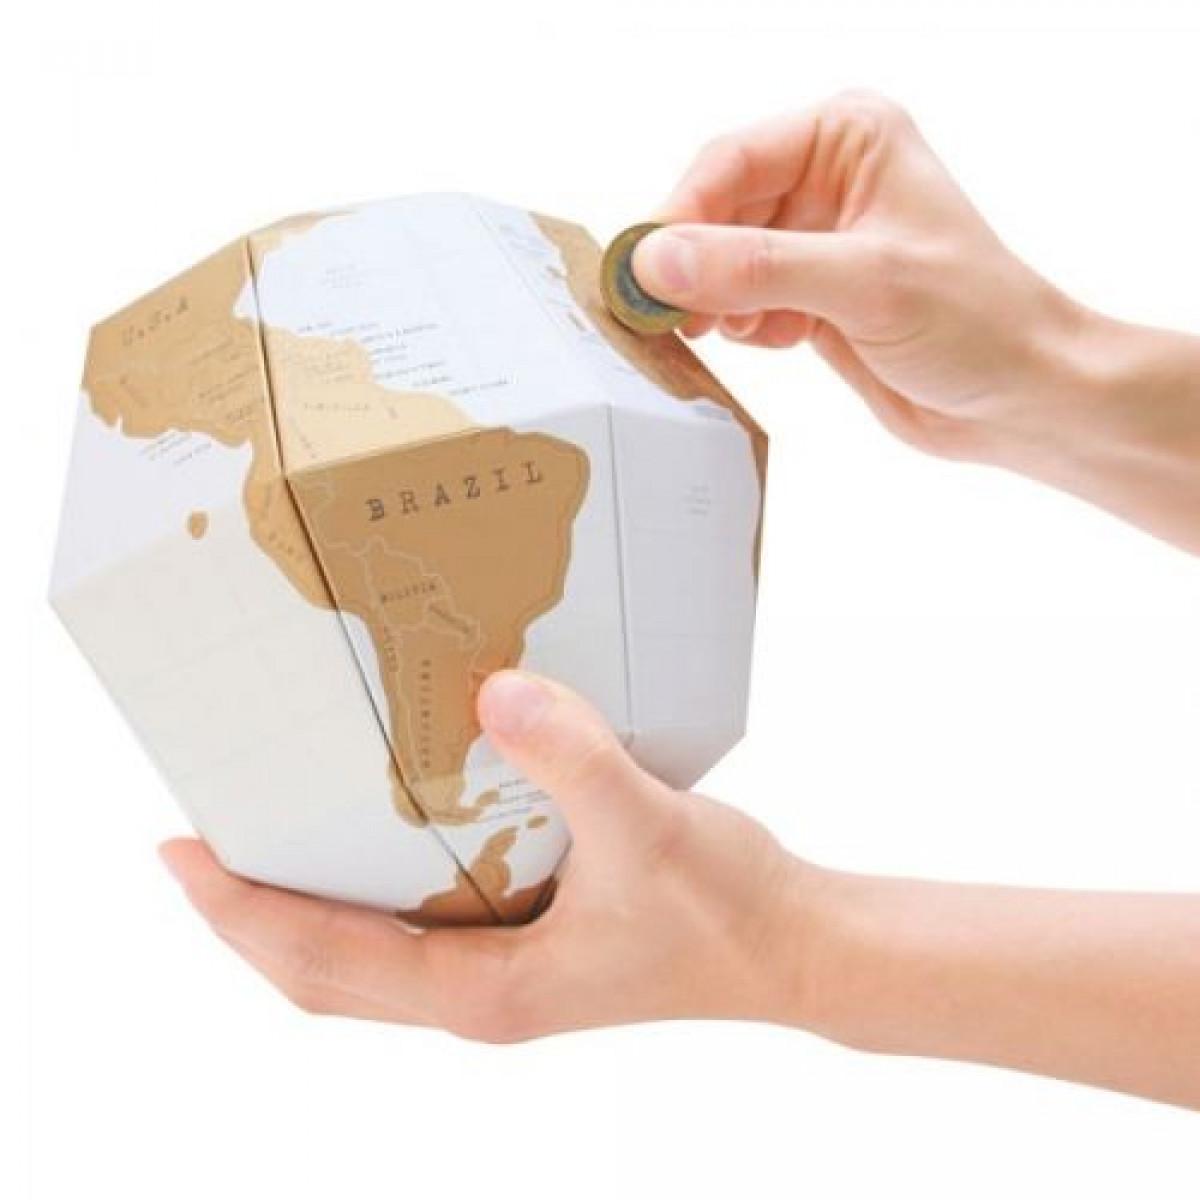 Kratzer-Globus